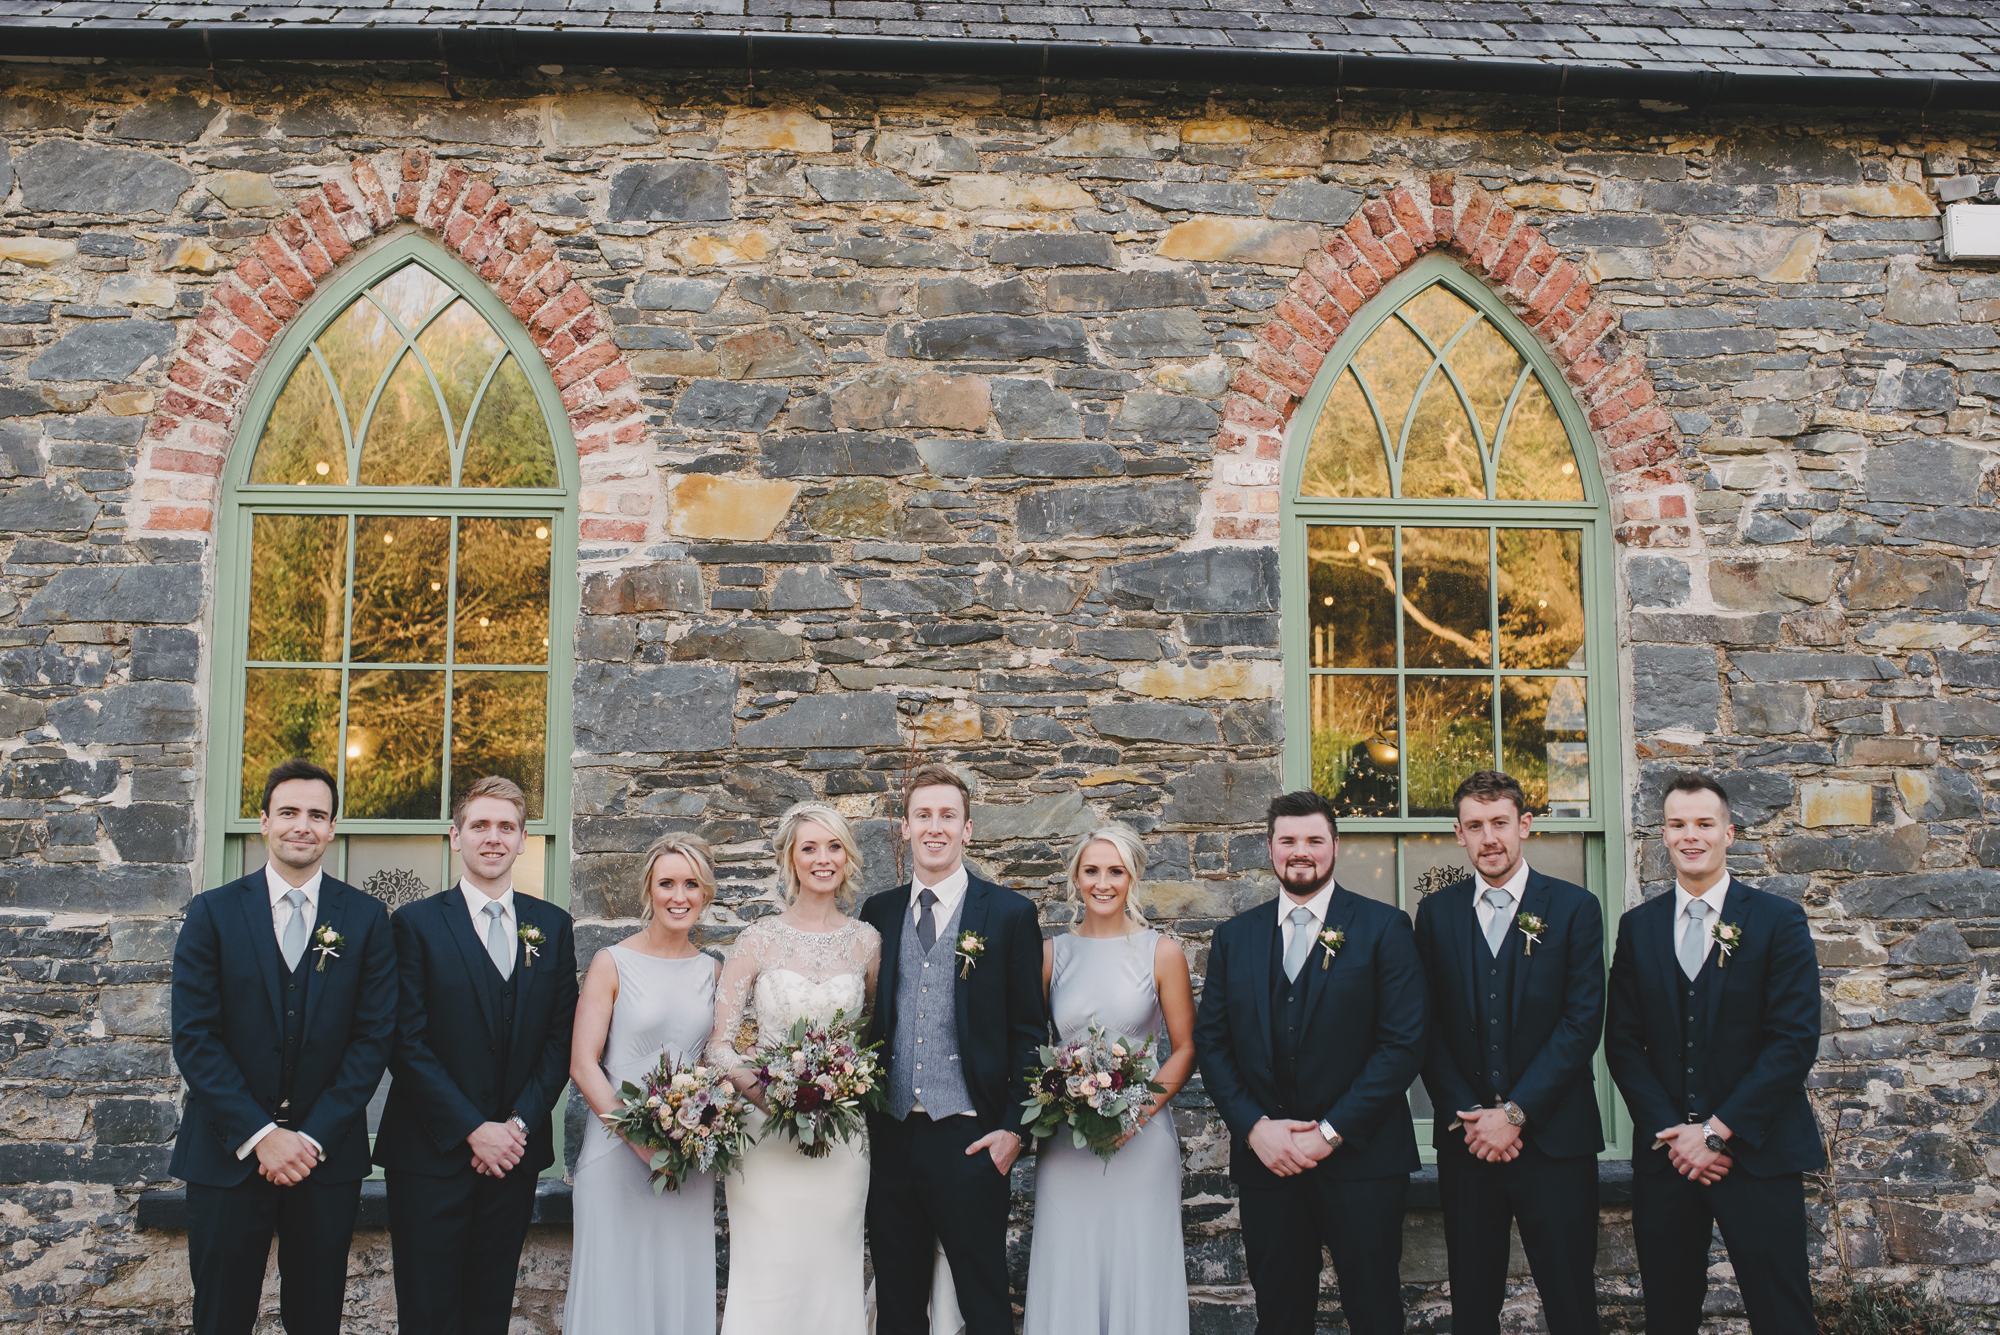 wedding_orange_tree_house_northern_ireland_4.jpg